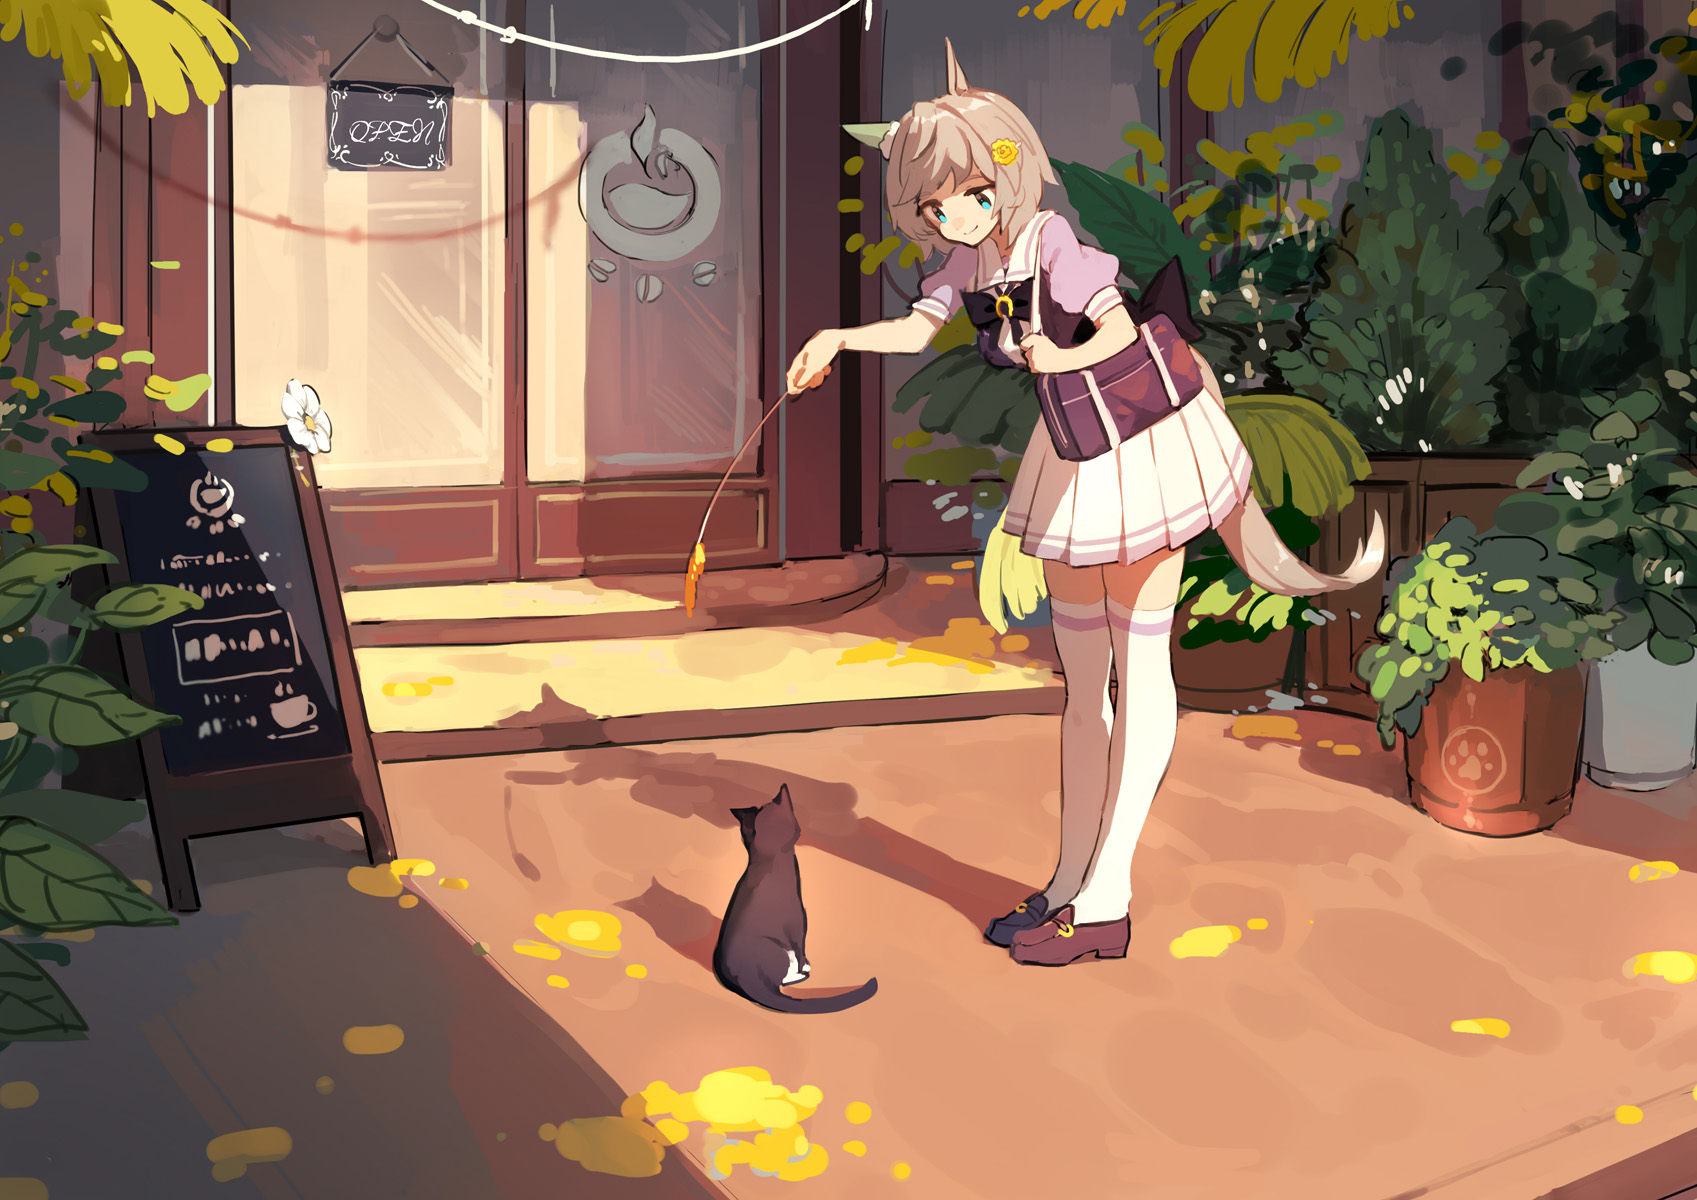 Anime 1697x1200 Uma Musume Pretty Derby anime girls short hair cats animal ears grey hair Seiun Sky (Uma Musume) school uniform fantasy girl